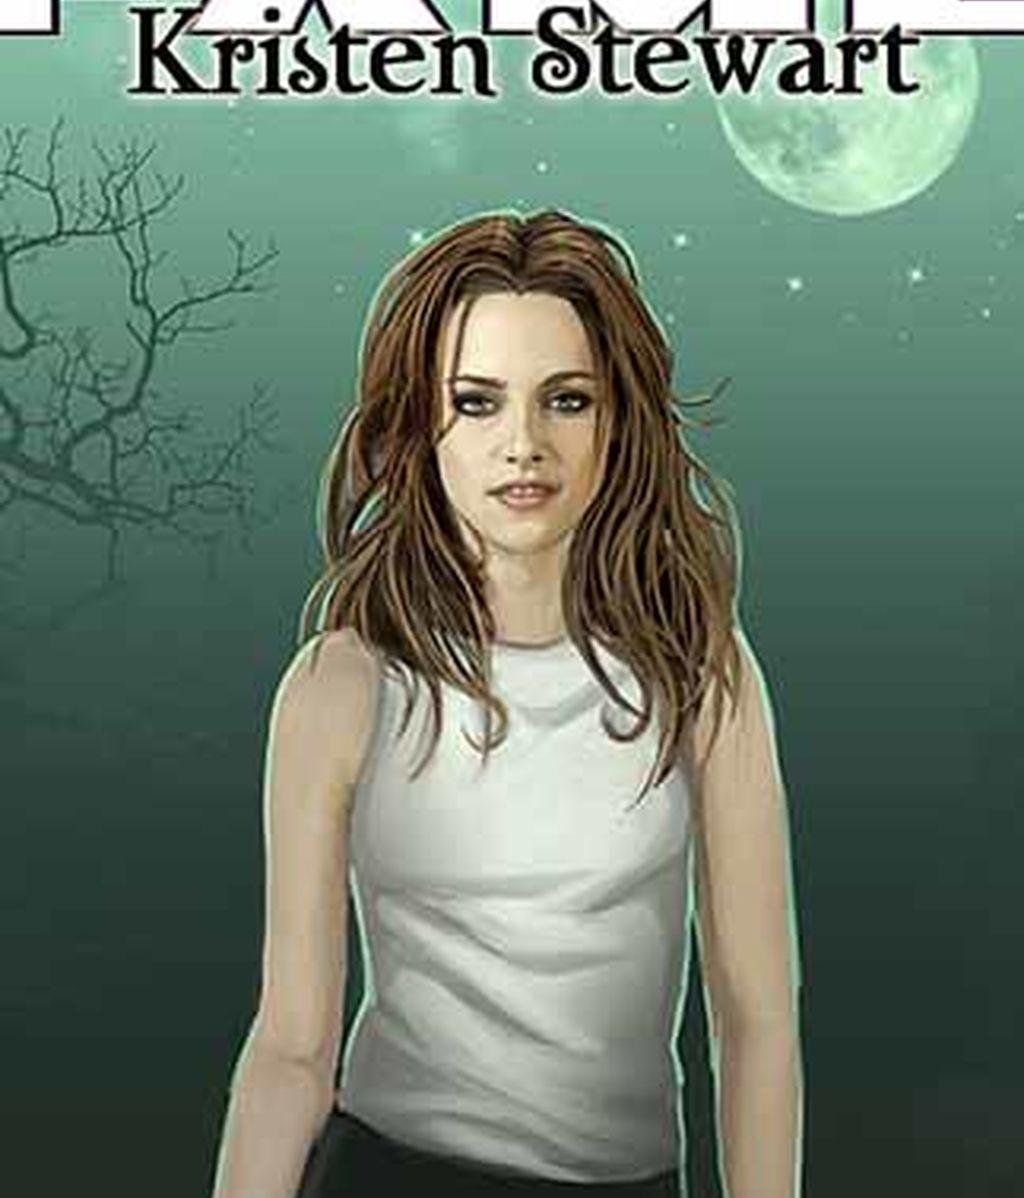 Kristen Stewart protagoniza un cómic